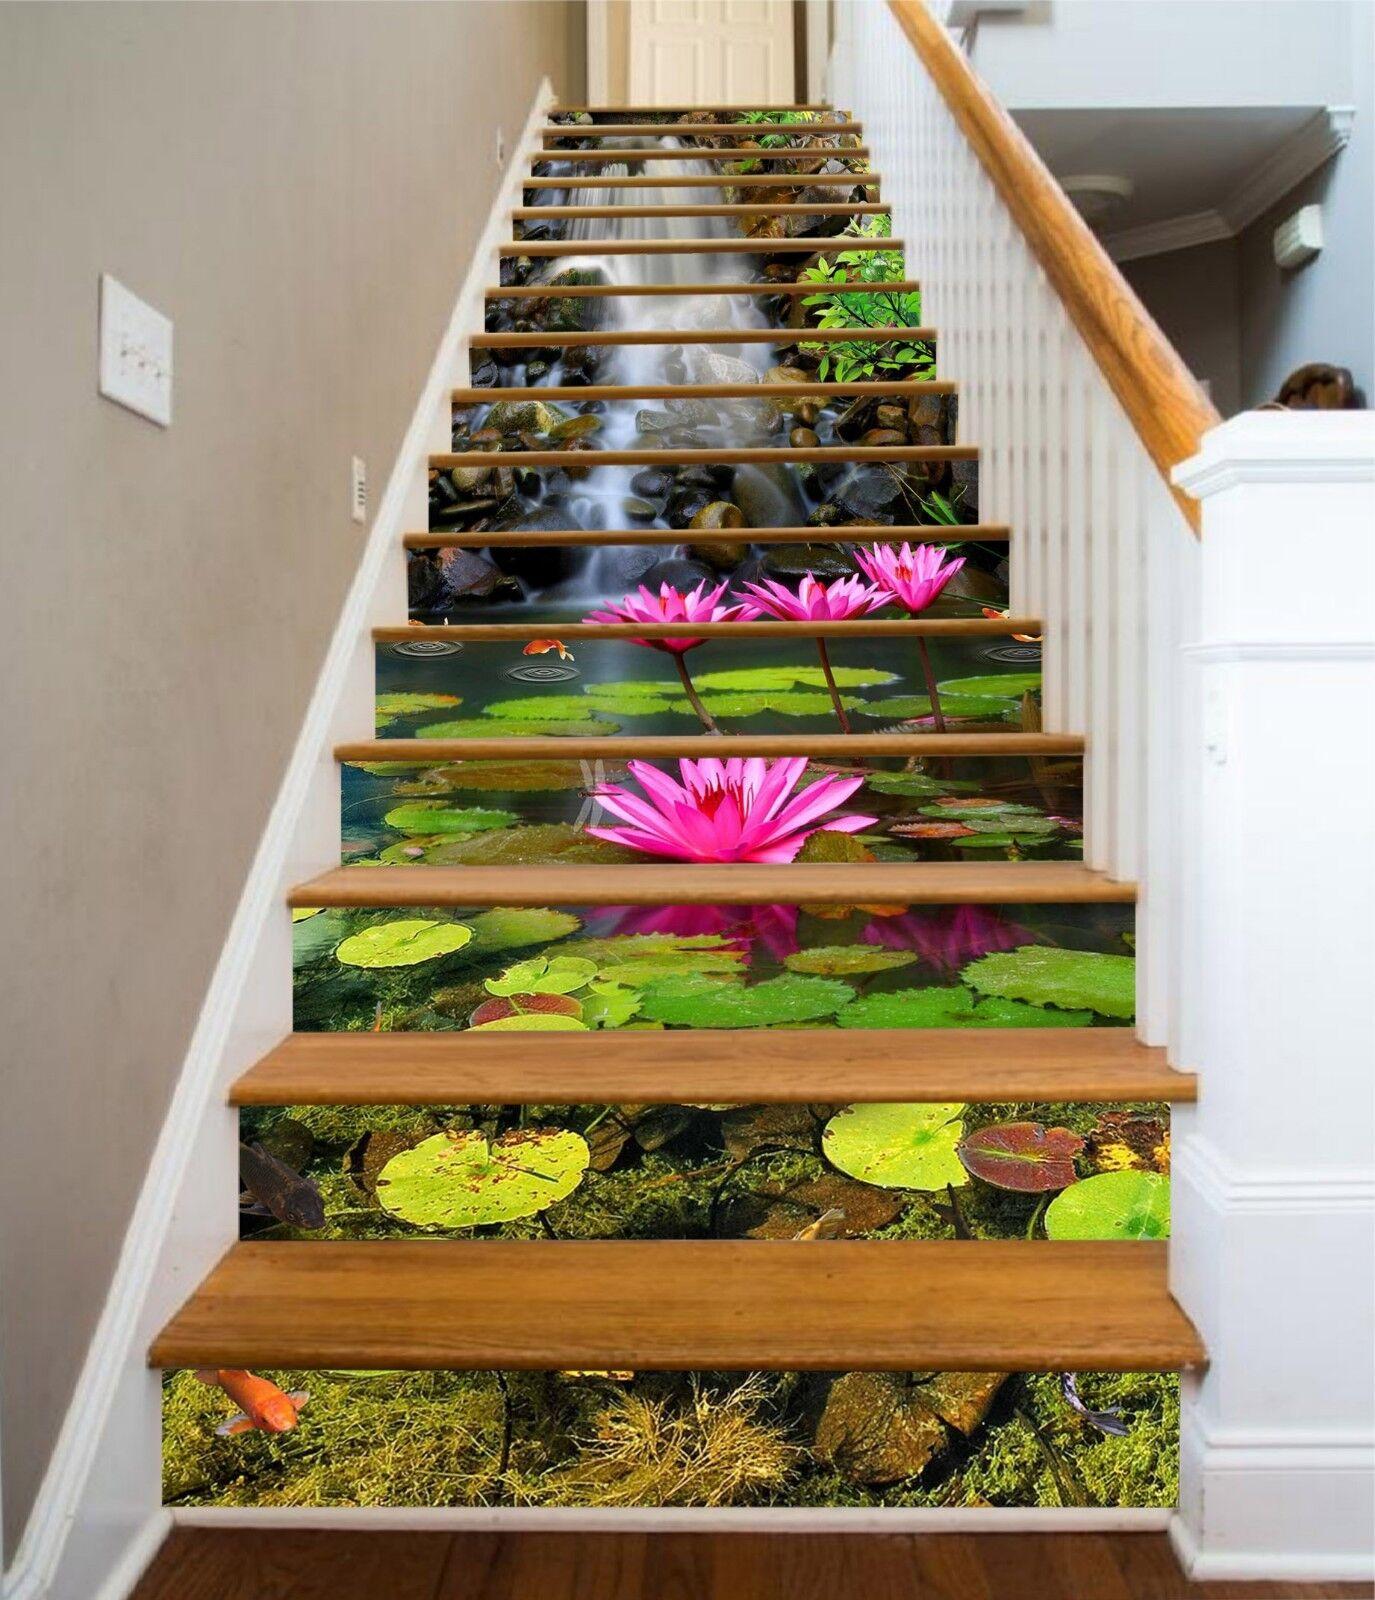 3D Stream Lotus 18 Stair Risers Decoration Photo Mural Vinyl Decal Wallpaper CA